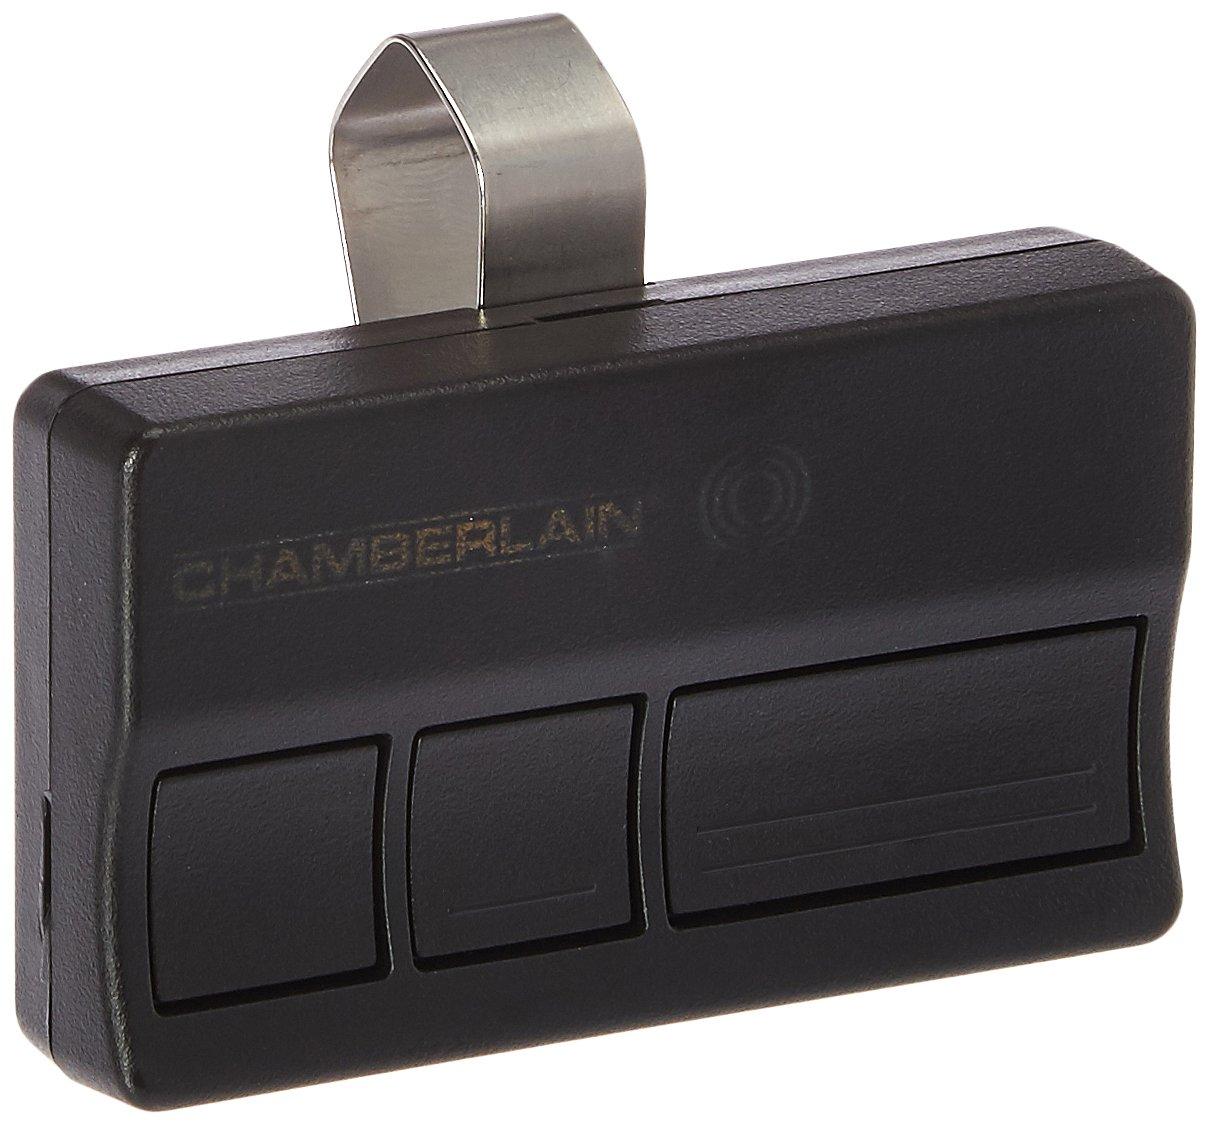 Best rated in garage door keypads remotes helpful customer liftmaster 373lm garage door remote controls product image rubansaba